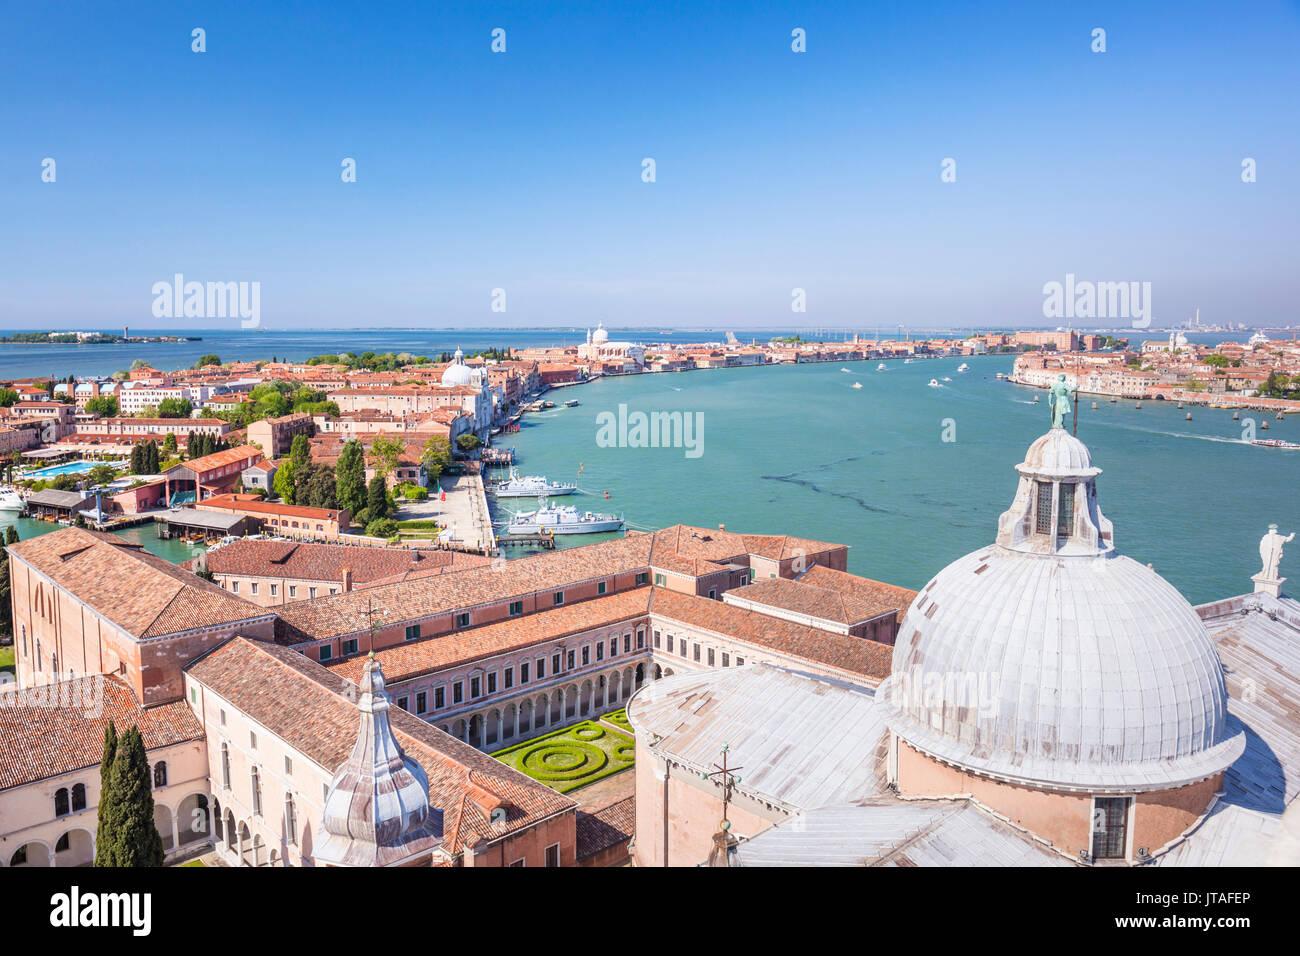 Iglesia de San Giorgio Maggiore, techo y cúpula, con vista a la isla de Giudecca, Venecia, Sitio del Patrimonio Mundial de la UNESCO, Véneto, Italia, Europa Imagen De Stock